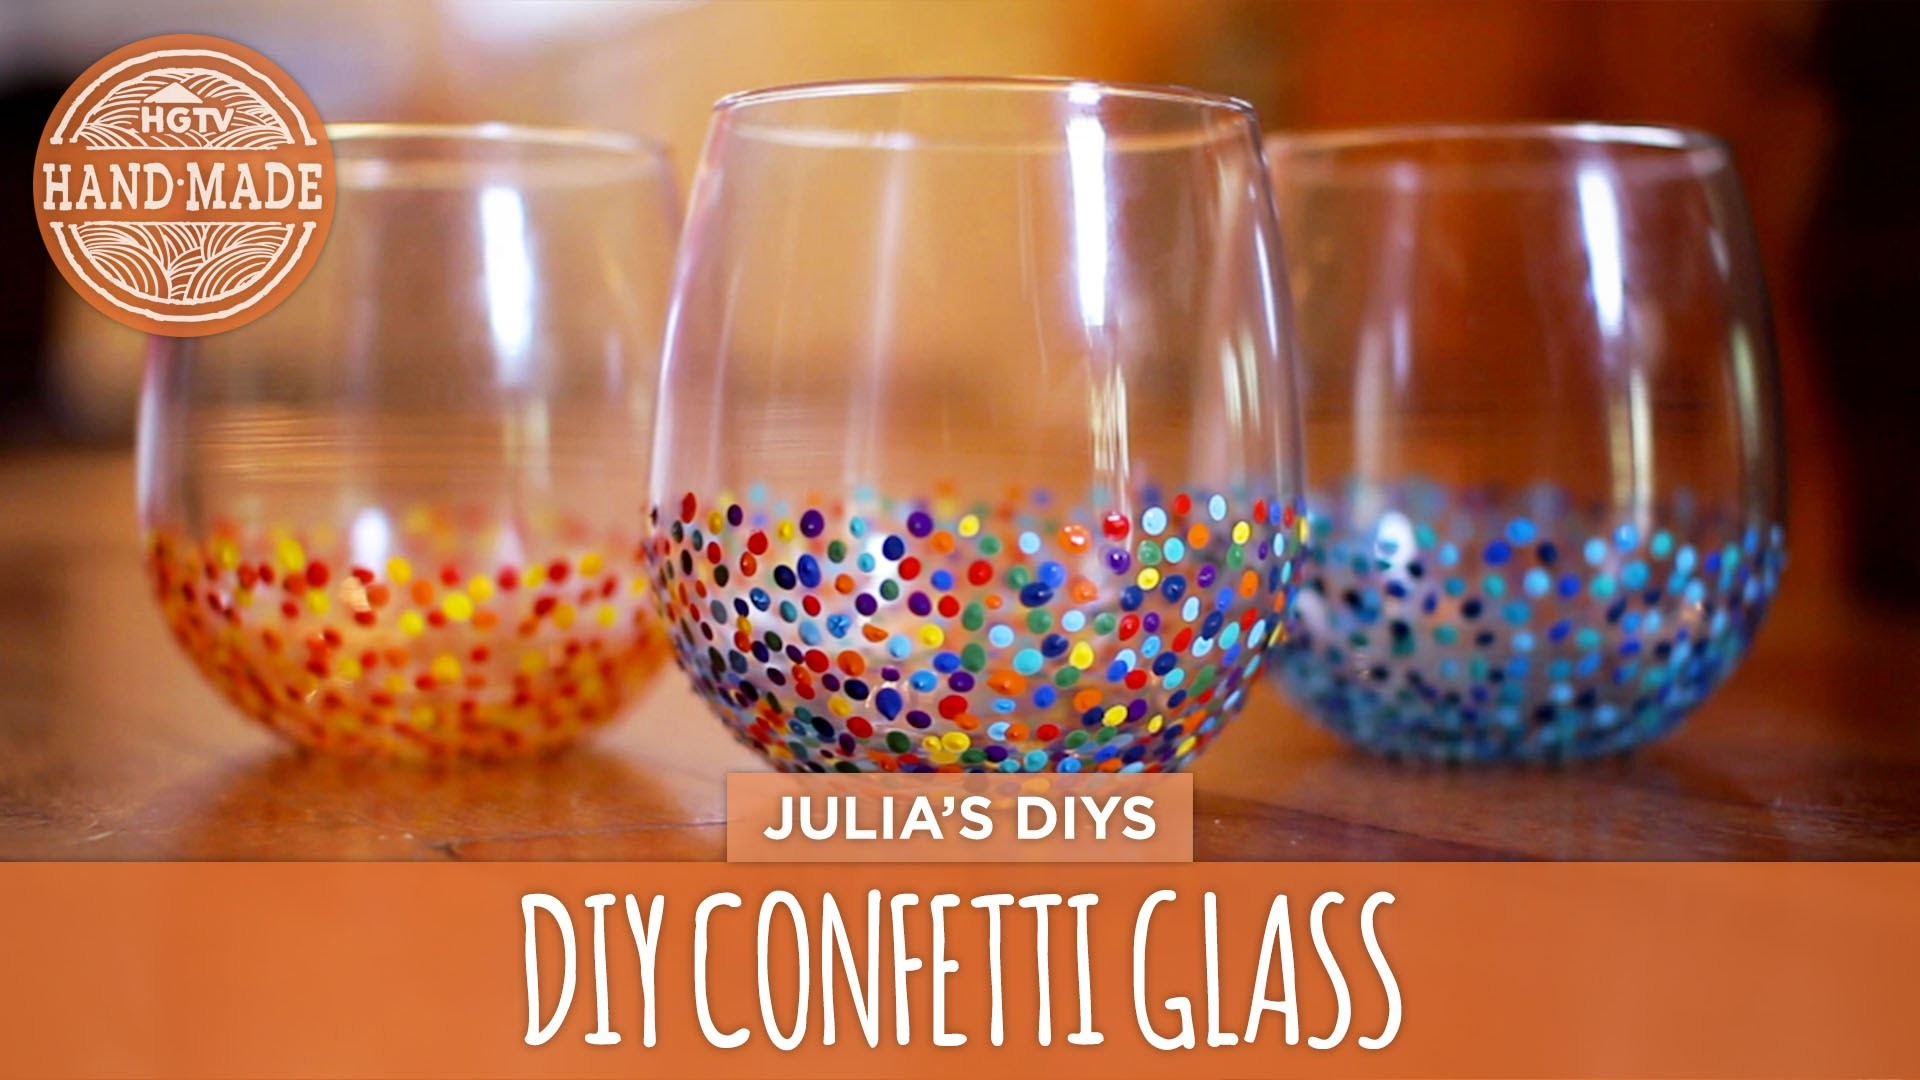 DIY Confetti Glasses - HGTV Handmade